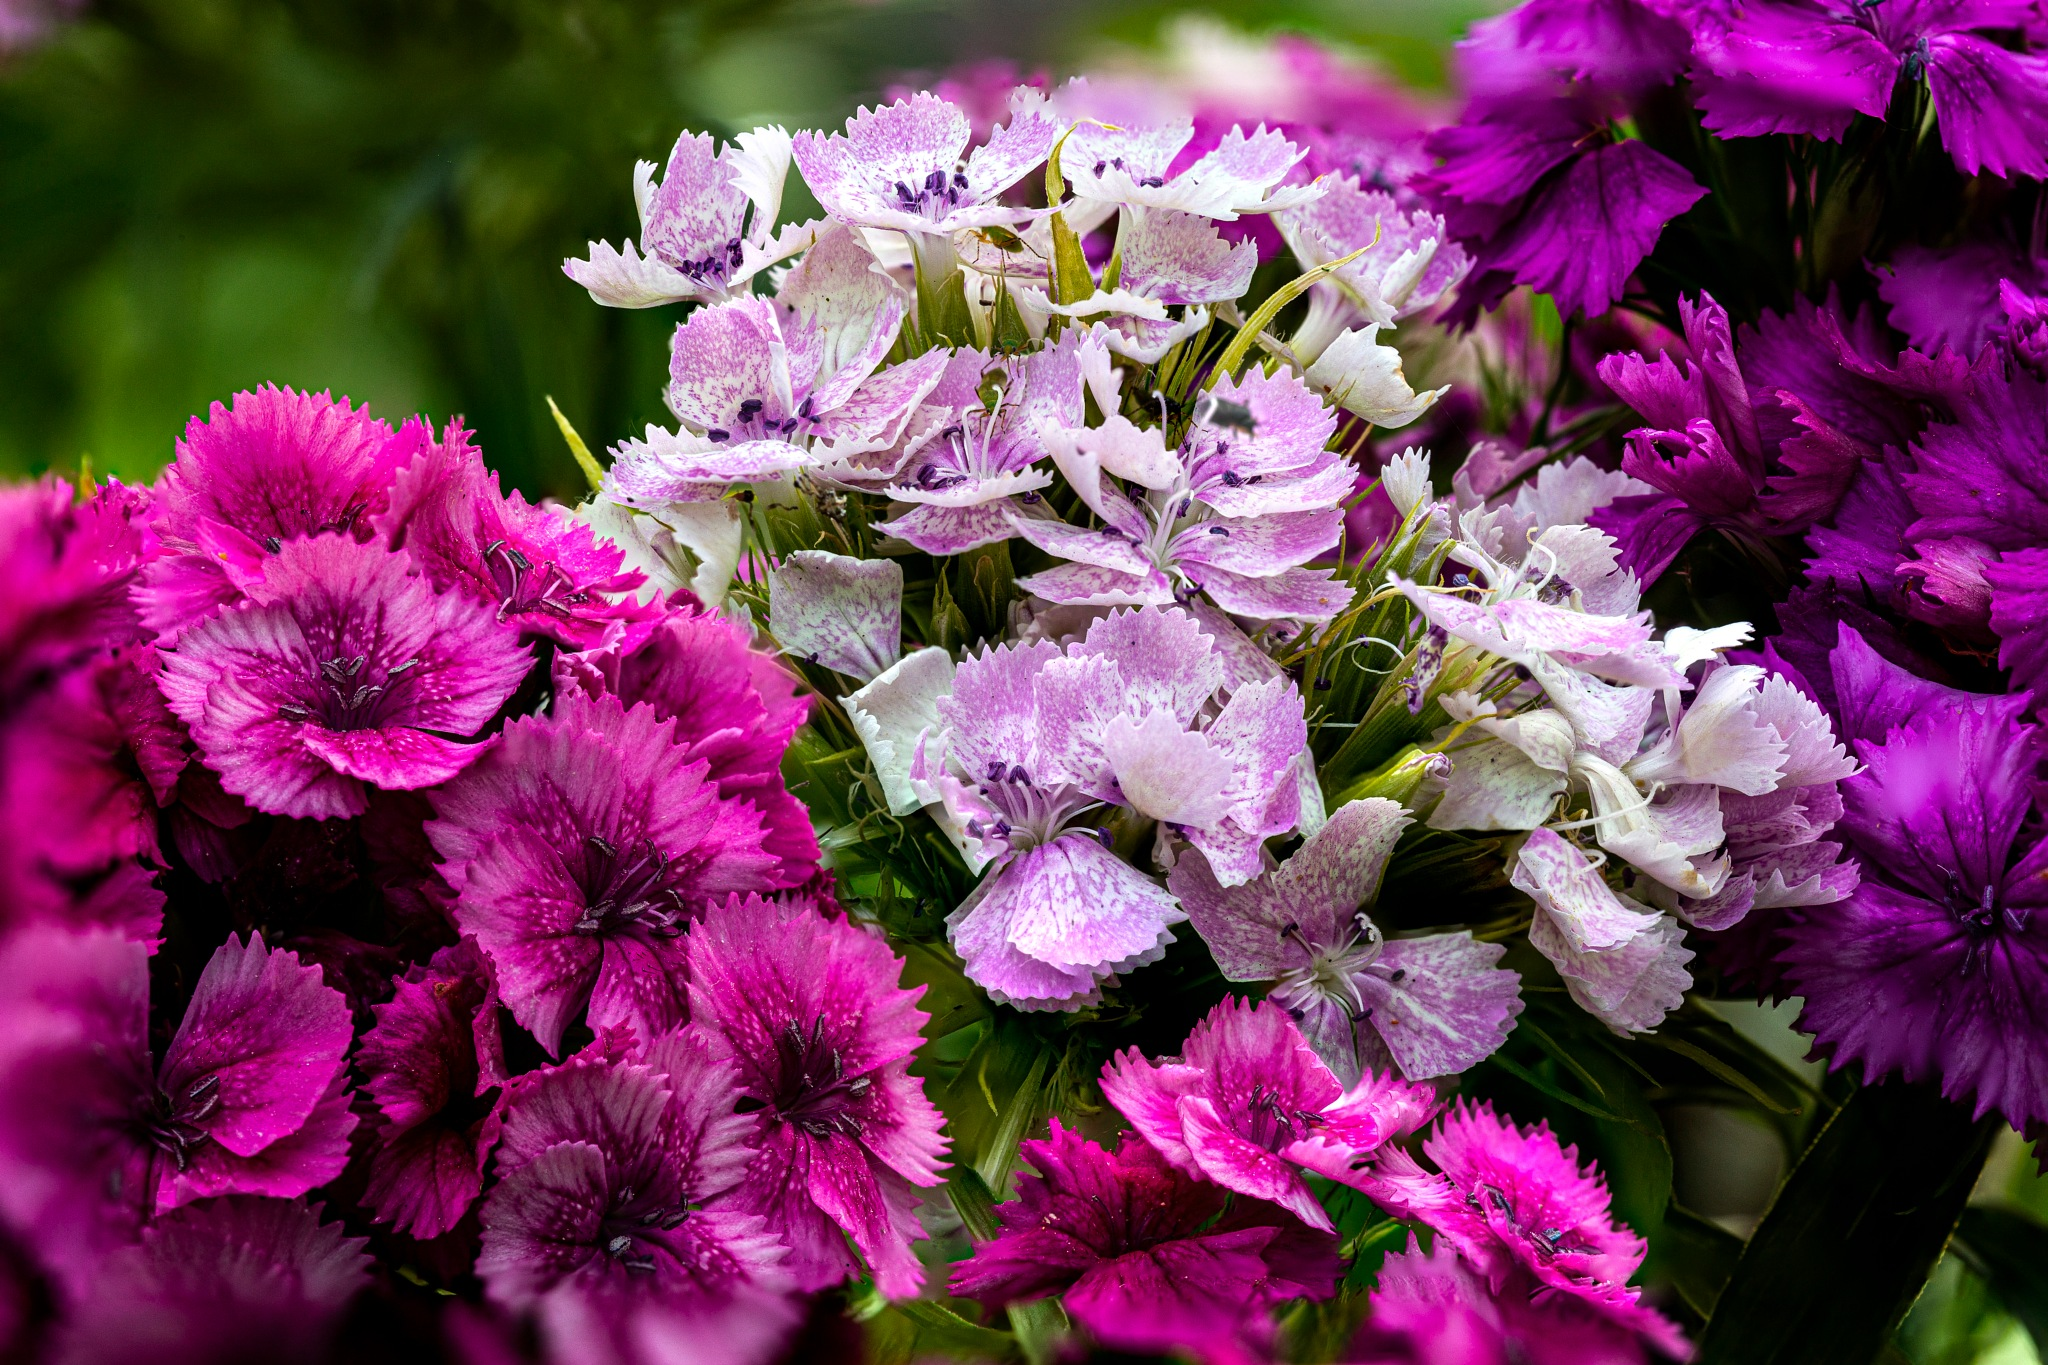 Carnations by carljan w carlsson